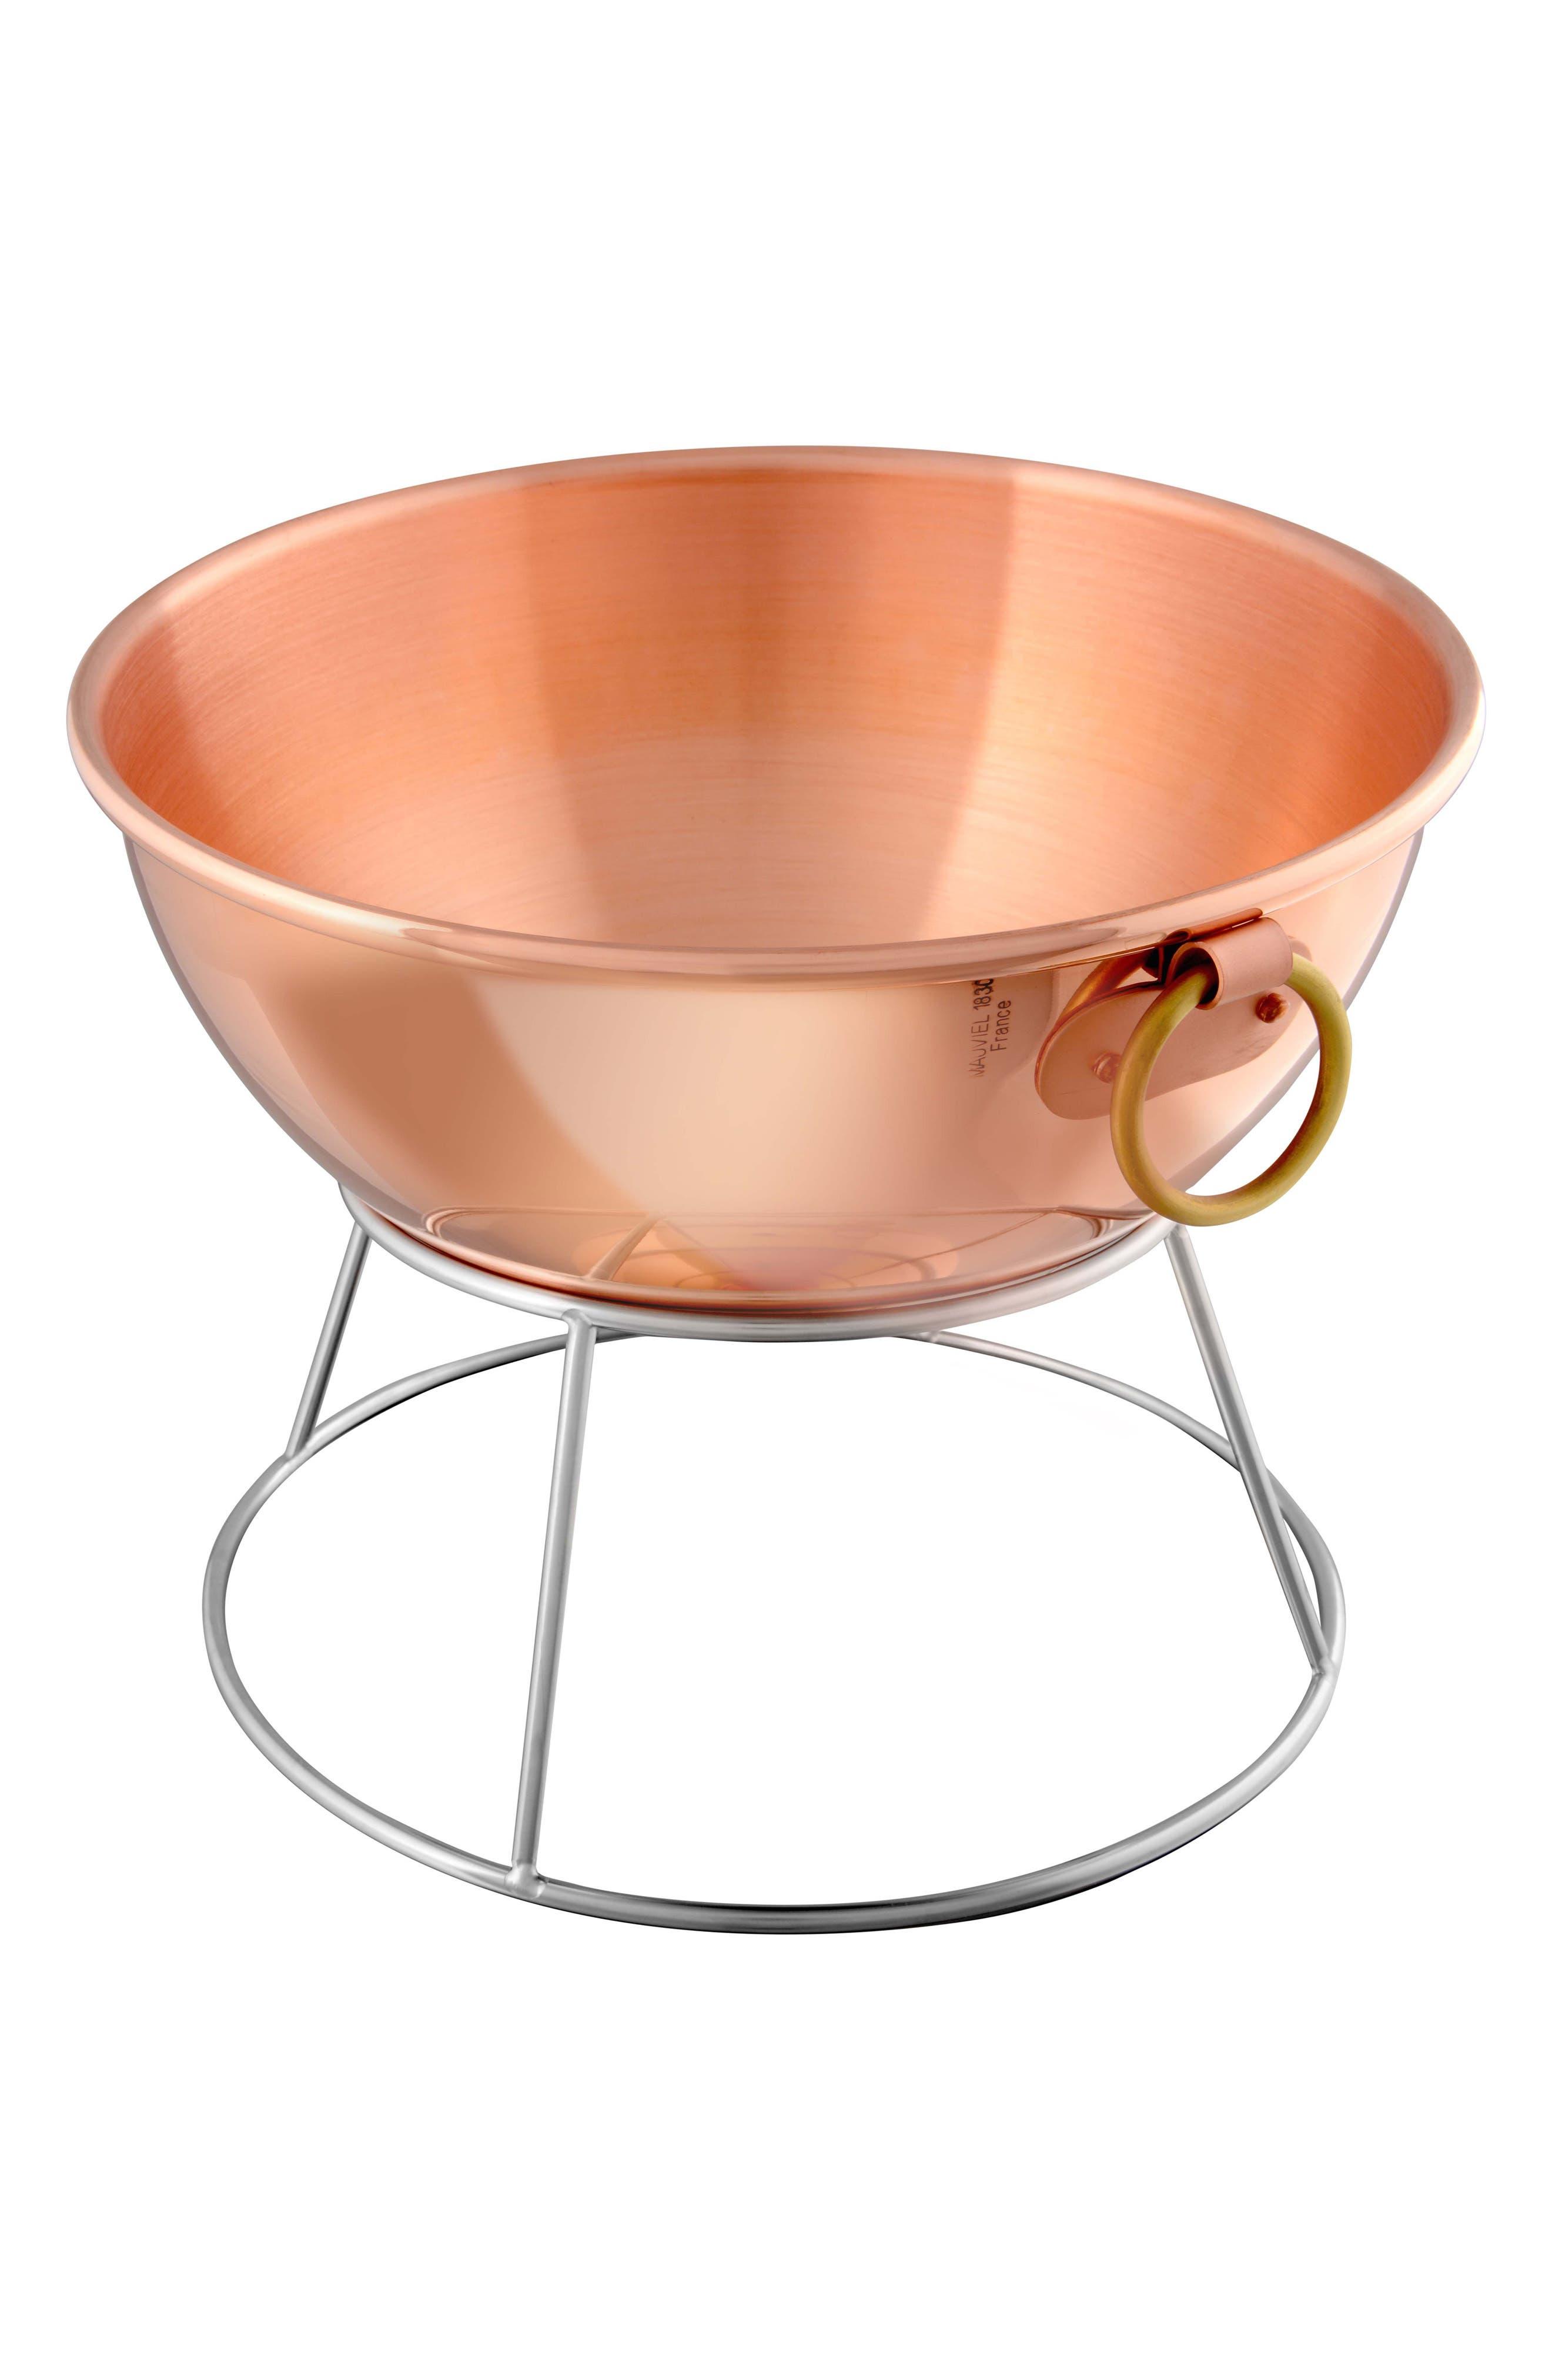 M'passion Copper Egg White Beating Bowl,                         Main,                         color, Copper